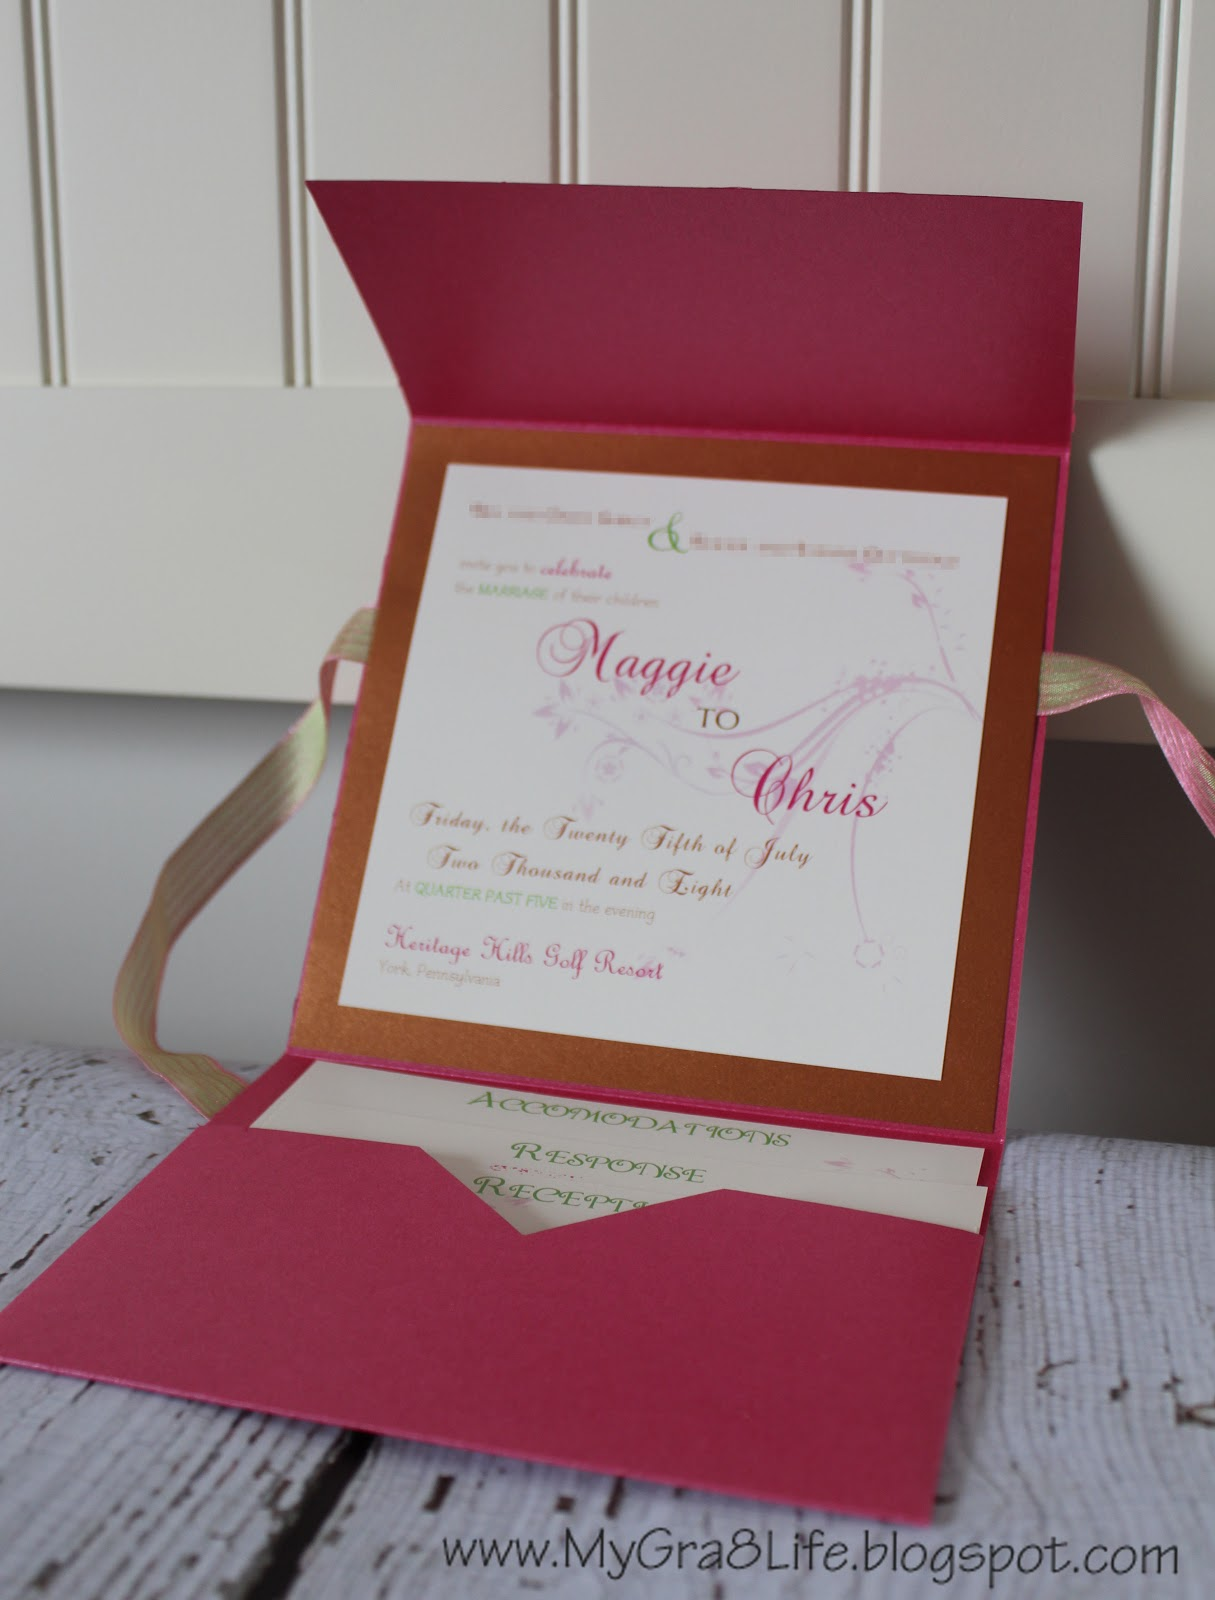 My Gra 8 Life: Creative Wedding Ideas ~ Elegant Tropical Theme (1)